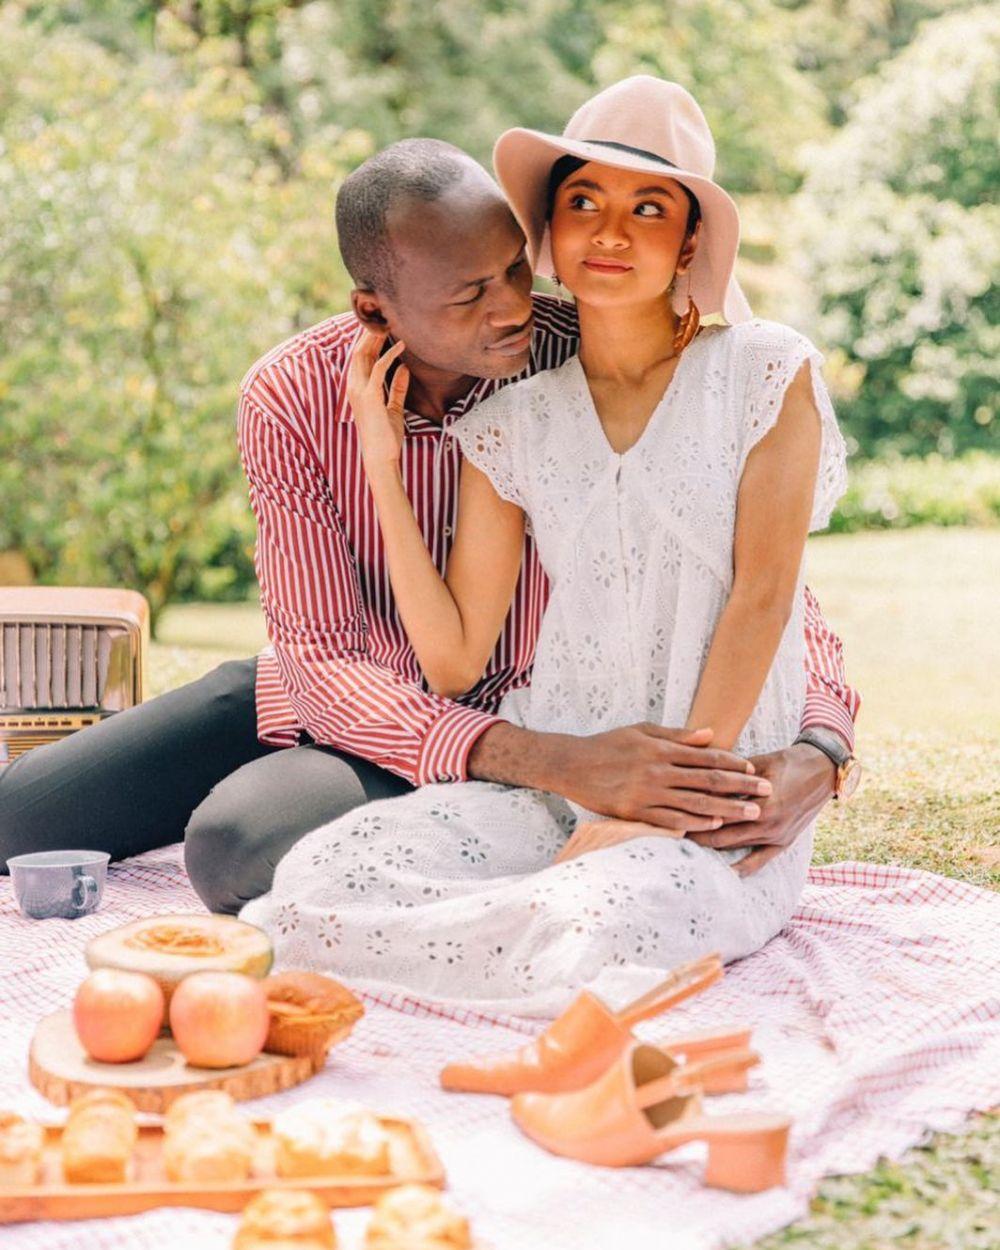 kabar wanita nikah pria Afrika © Instagram